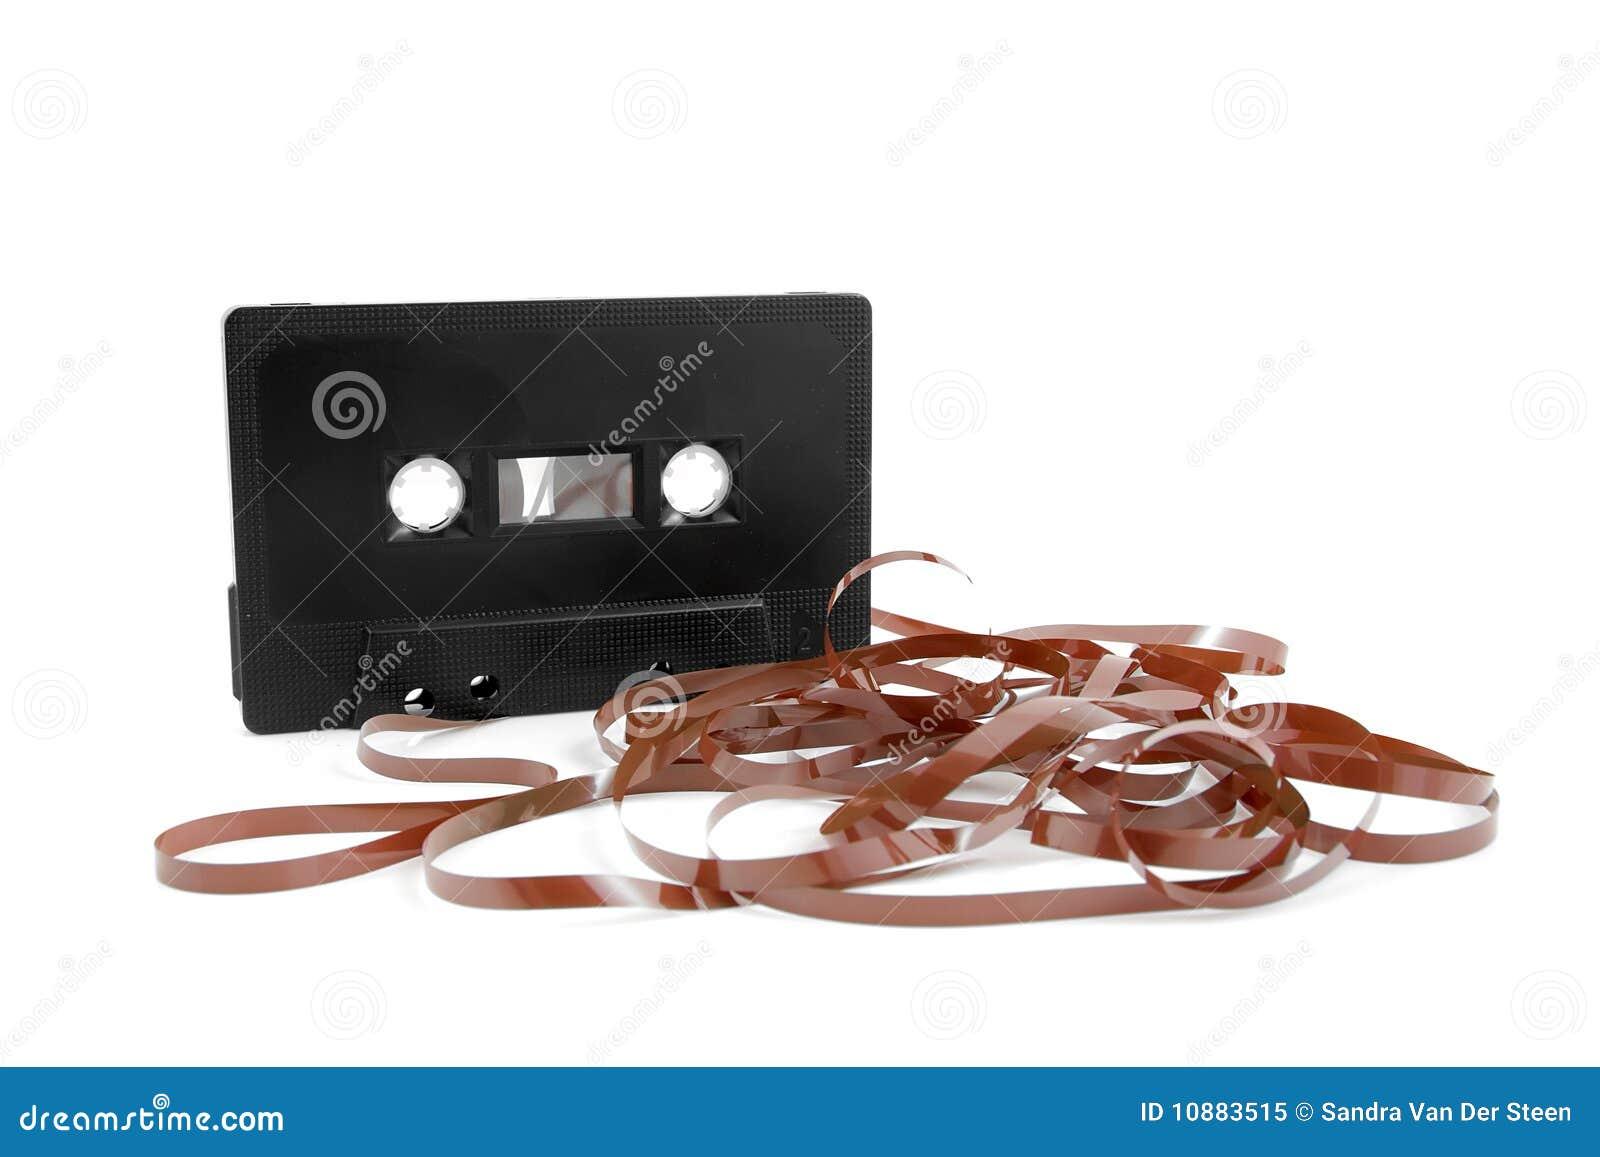 messed up audio cassette tape stock image image of mess broken 10883515. Black Bedroom Furniture Sets. Home Design Ideas